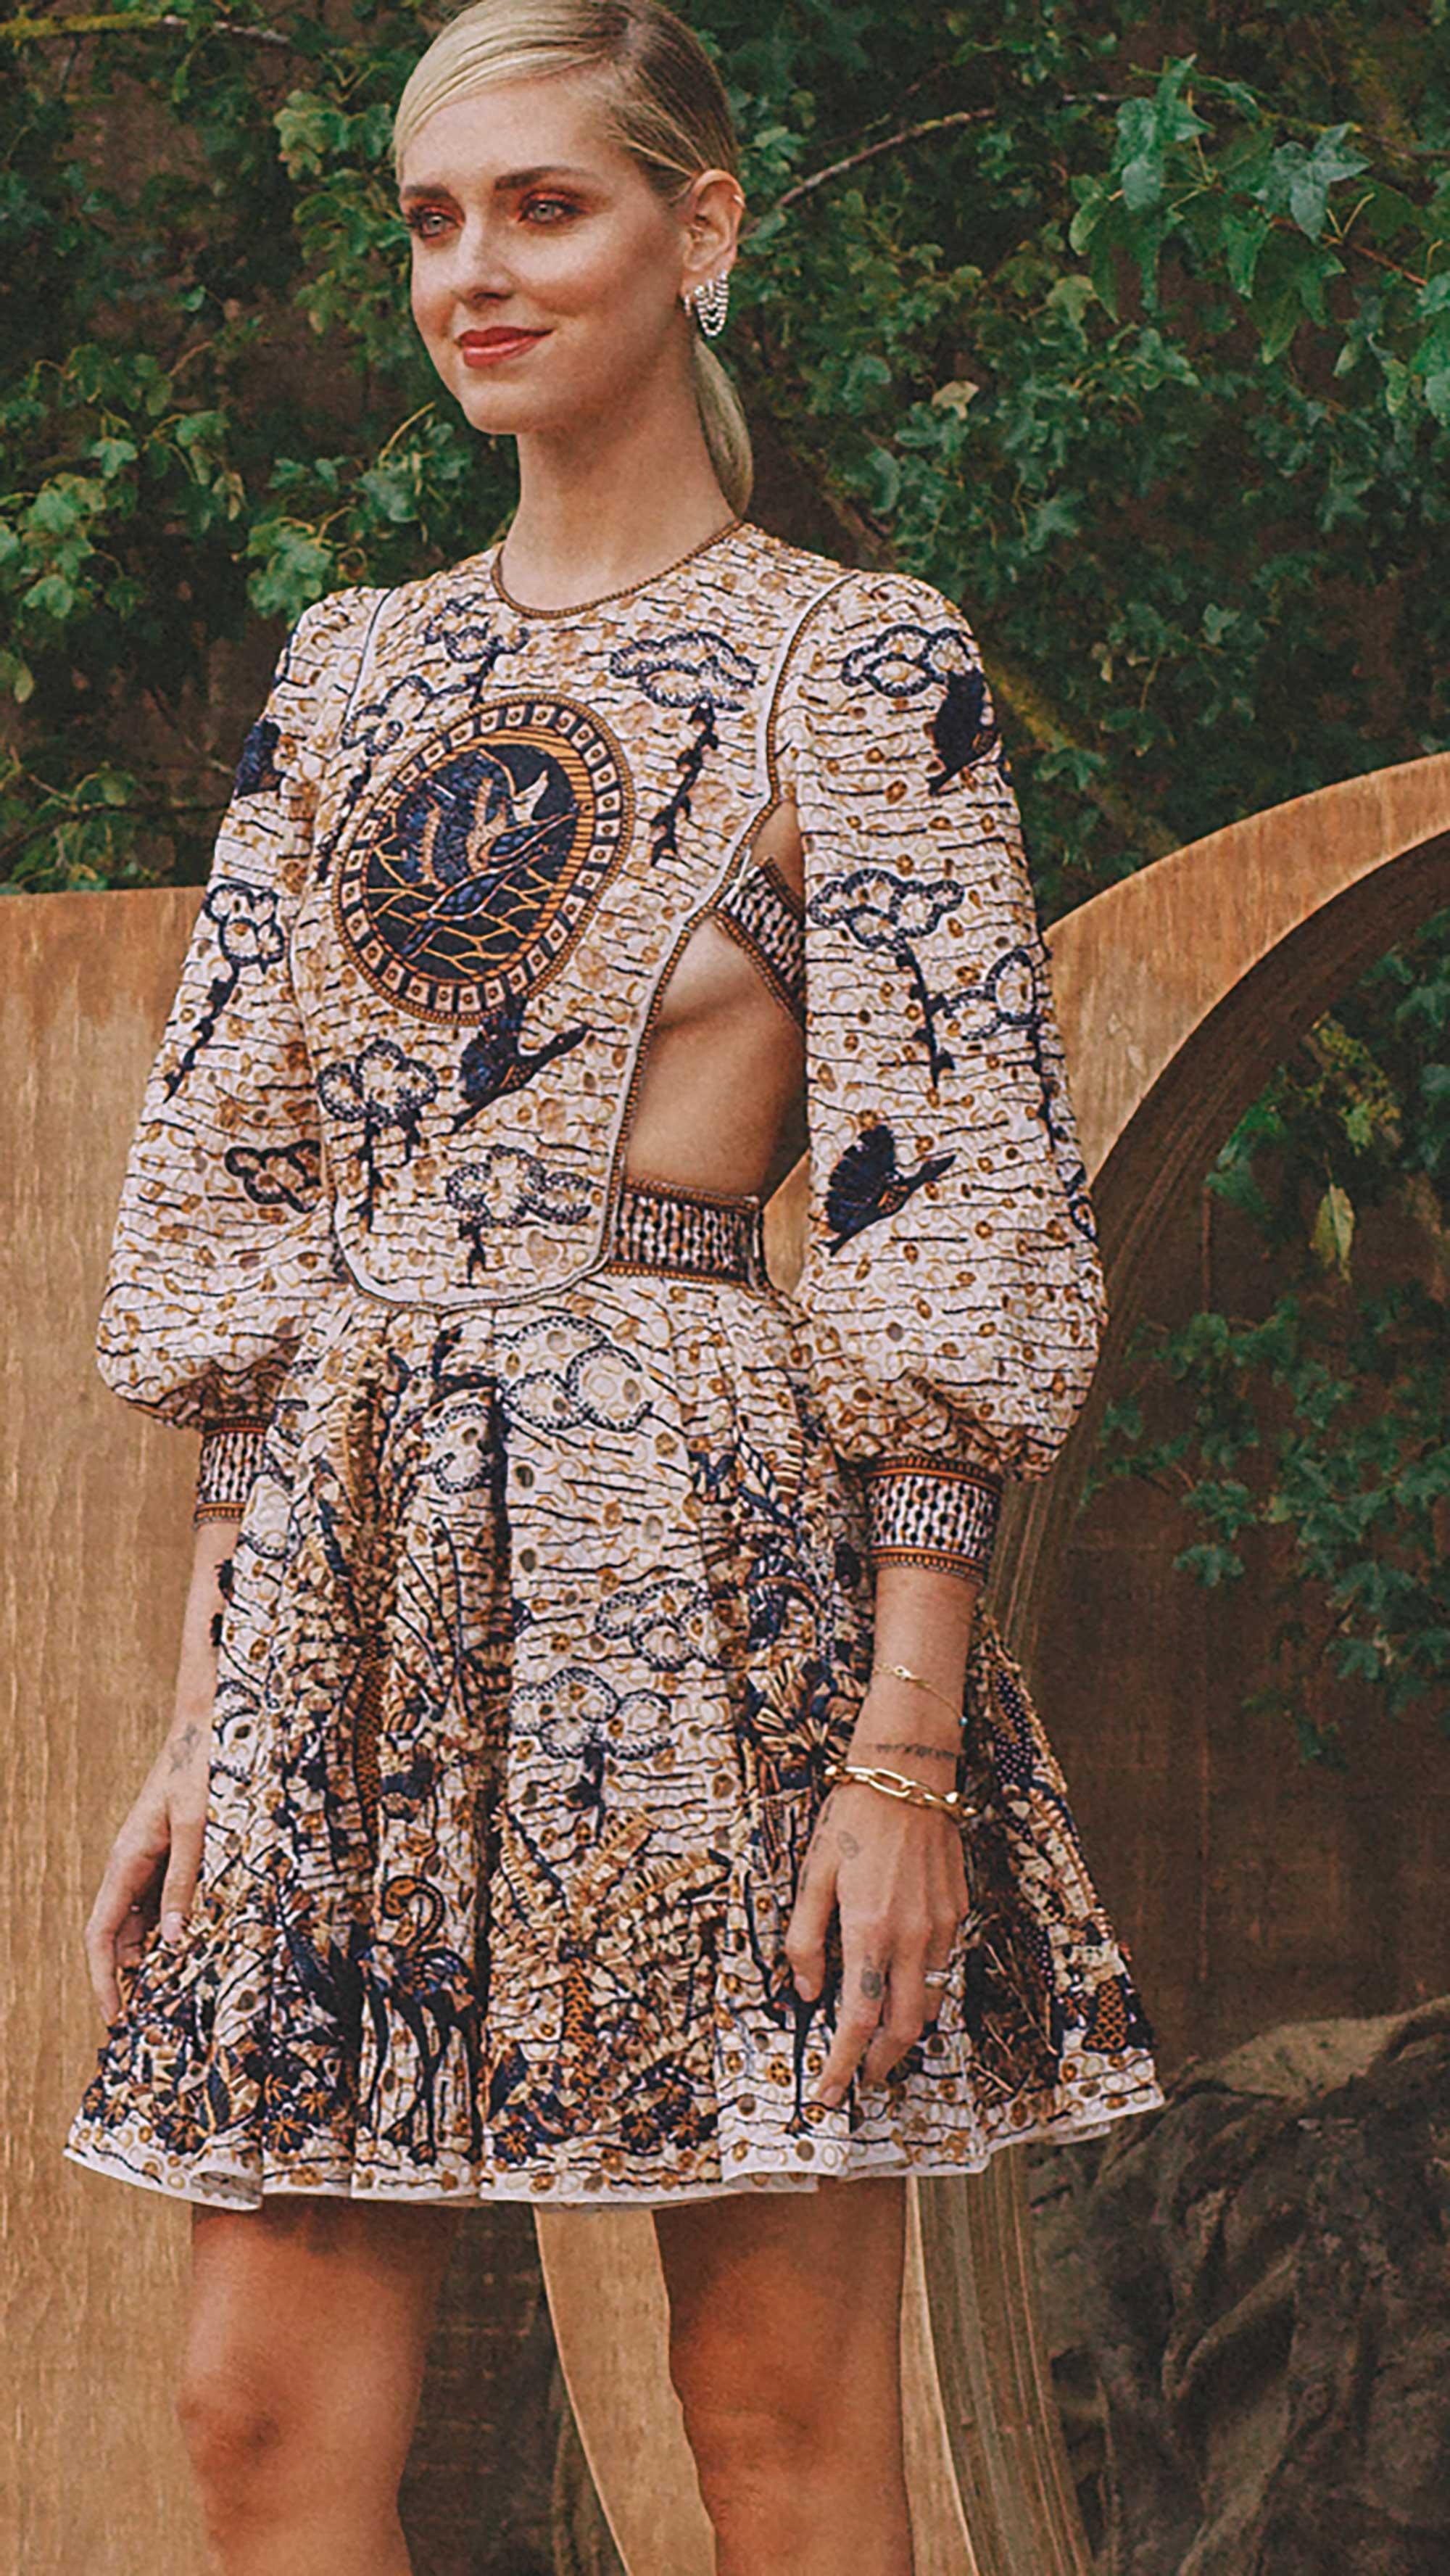 Best outfits of Paris Fashion Week street style 2019 day one PFW SS20 Photo by @J2martinez Jose J. Martinez -32.jpg